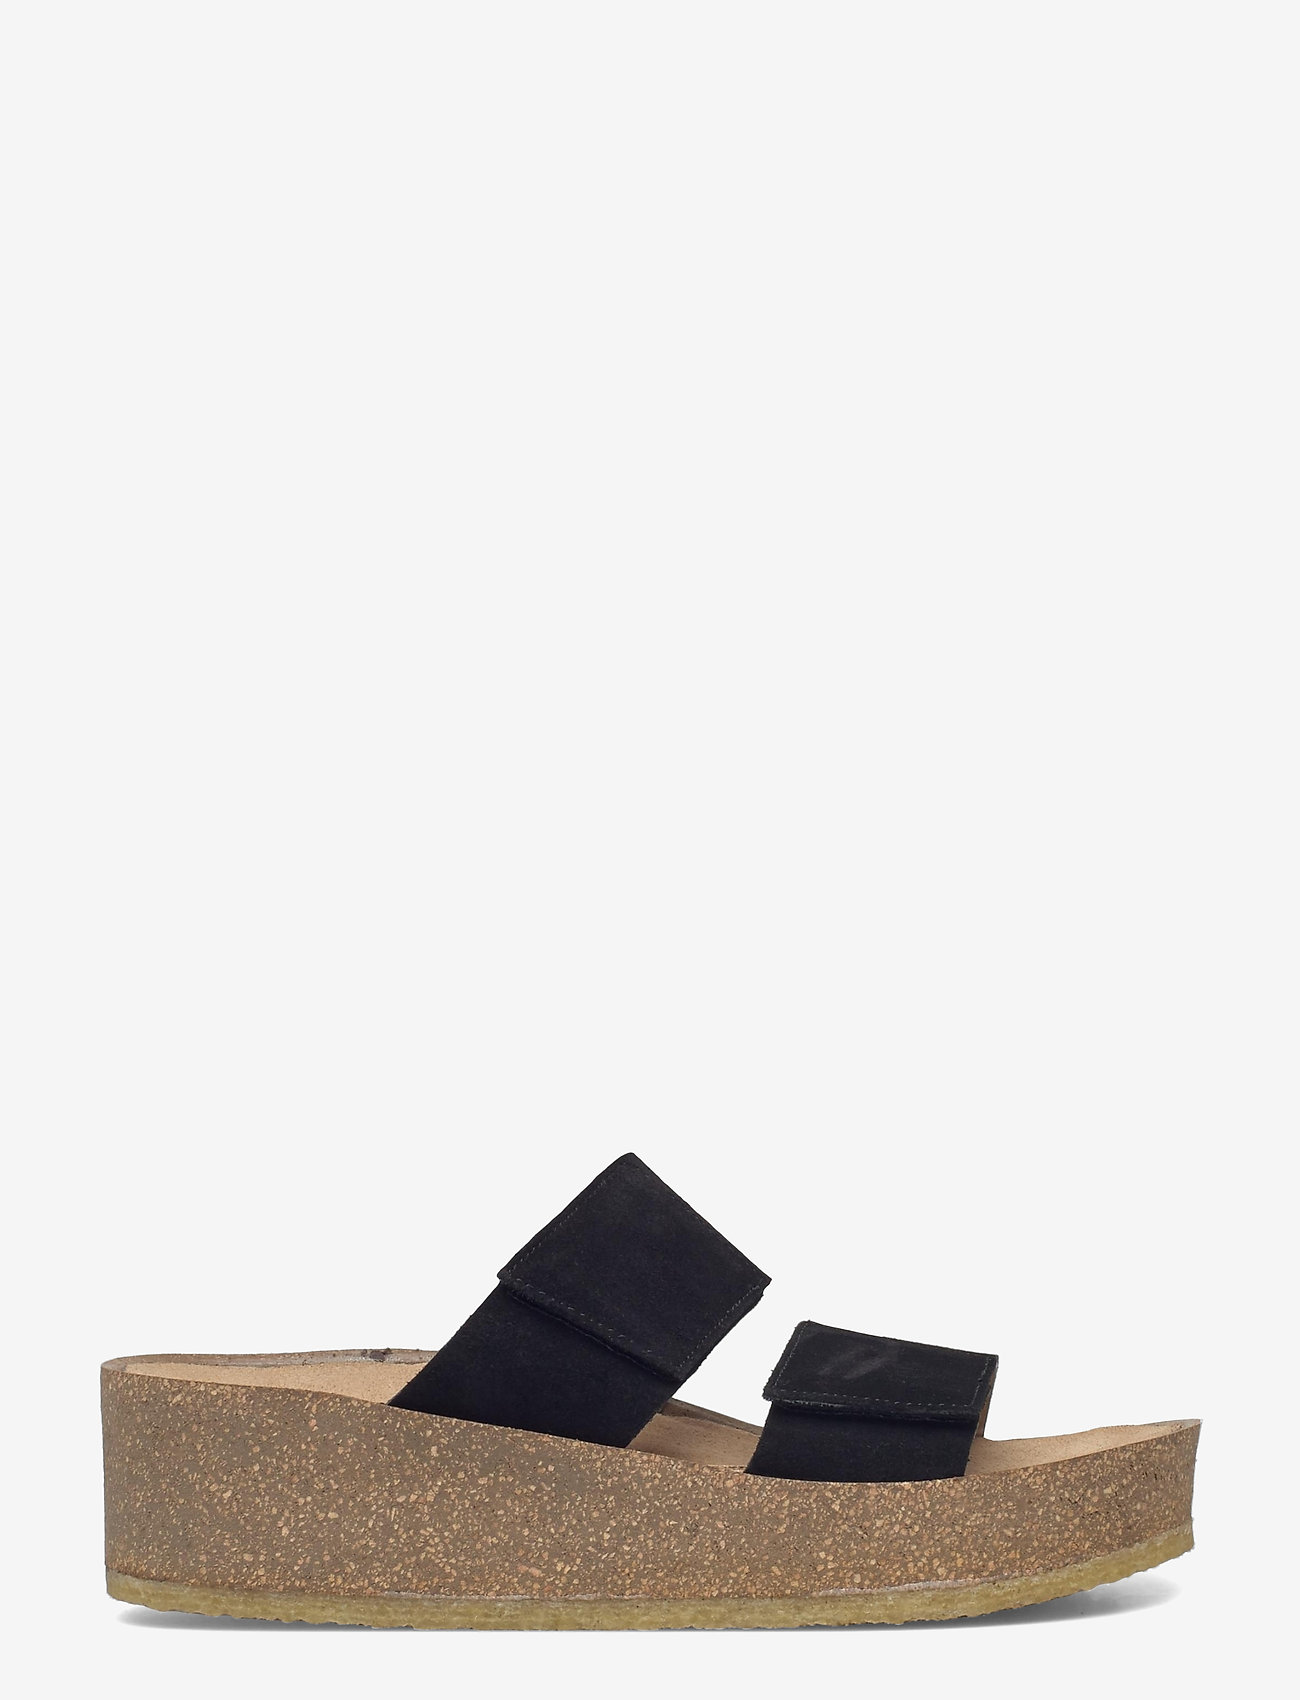 ANGULUS - Sandals - flat - open toe - op - sandalen mit absatz - 1163 black - 1